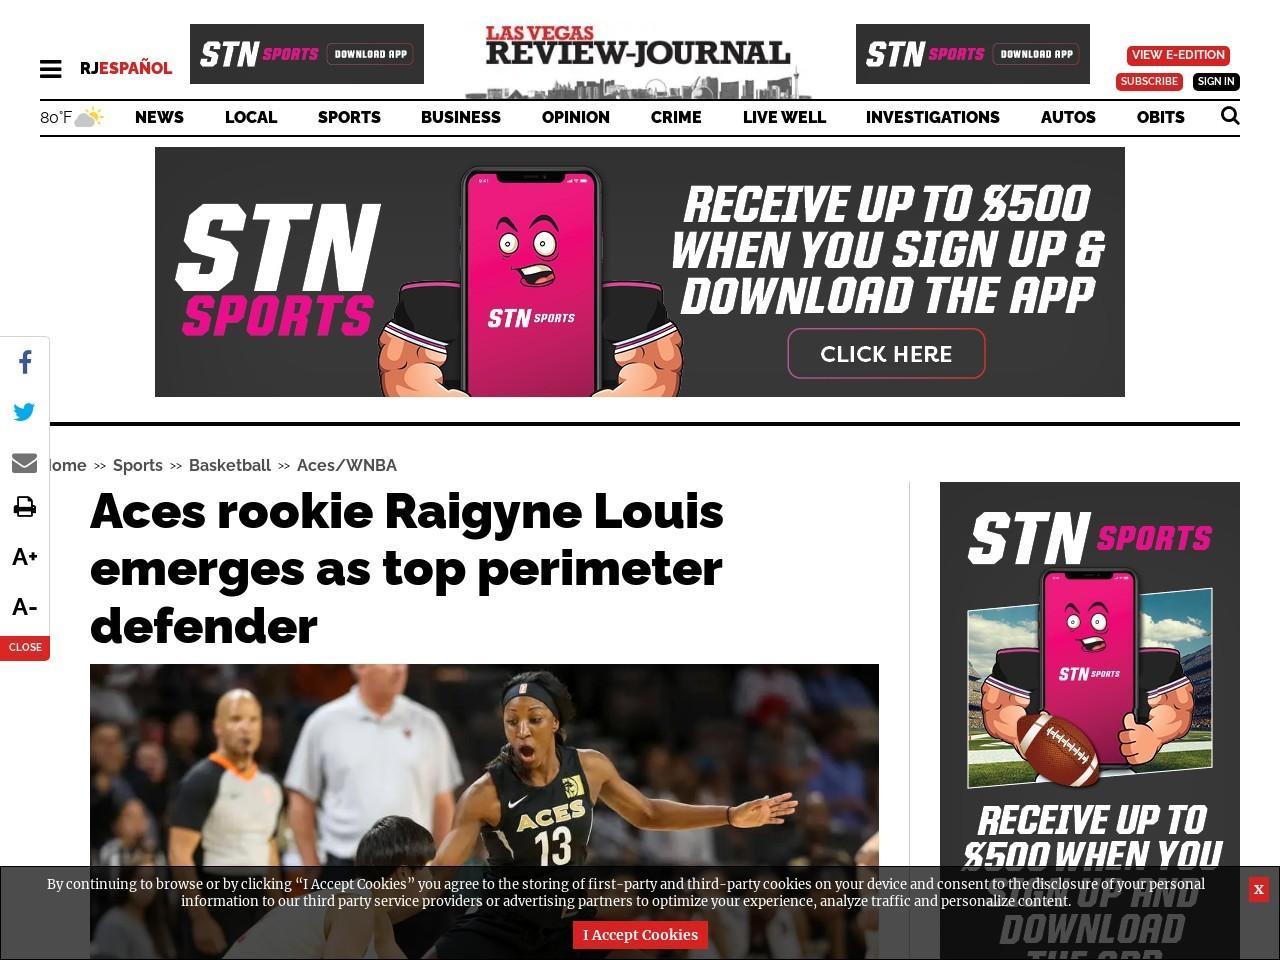 Aces rookie Raigyne Louis emerges as top perimeter defender